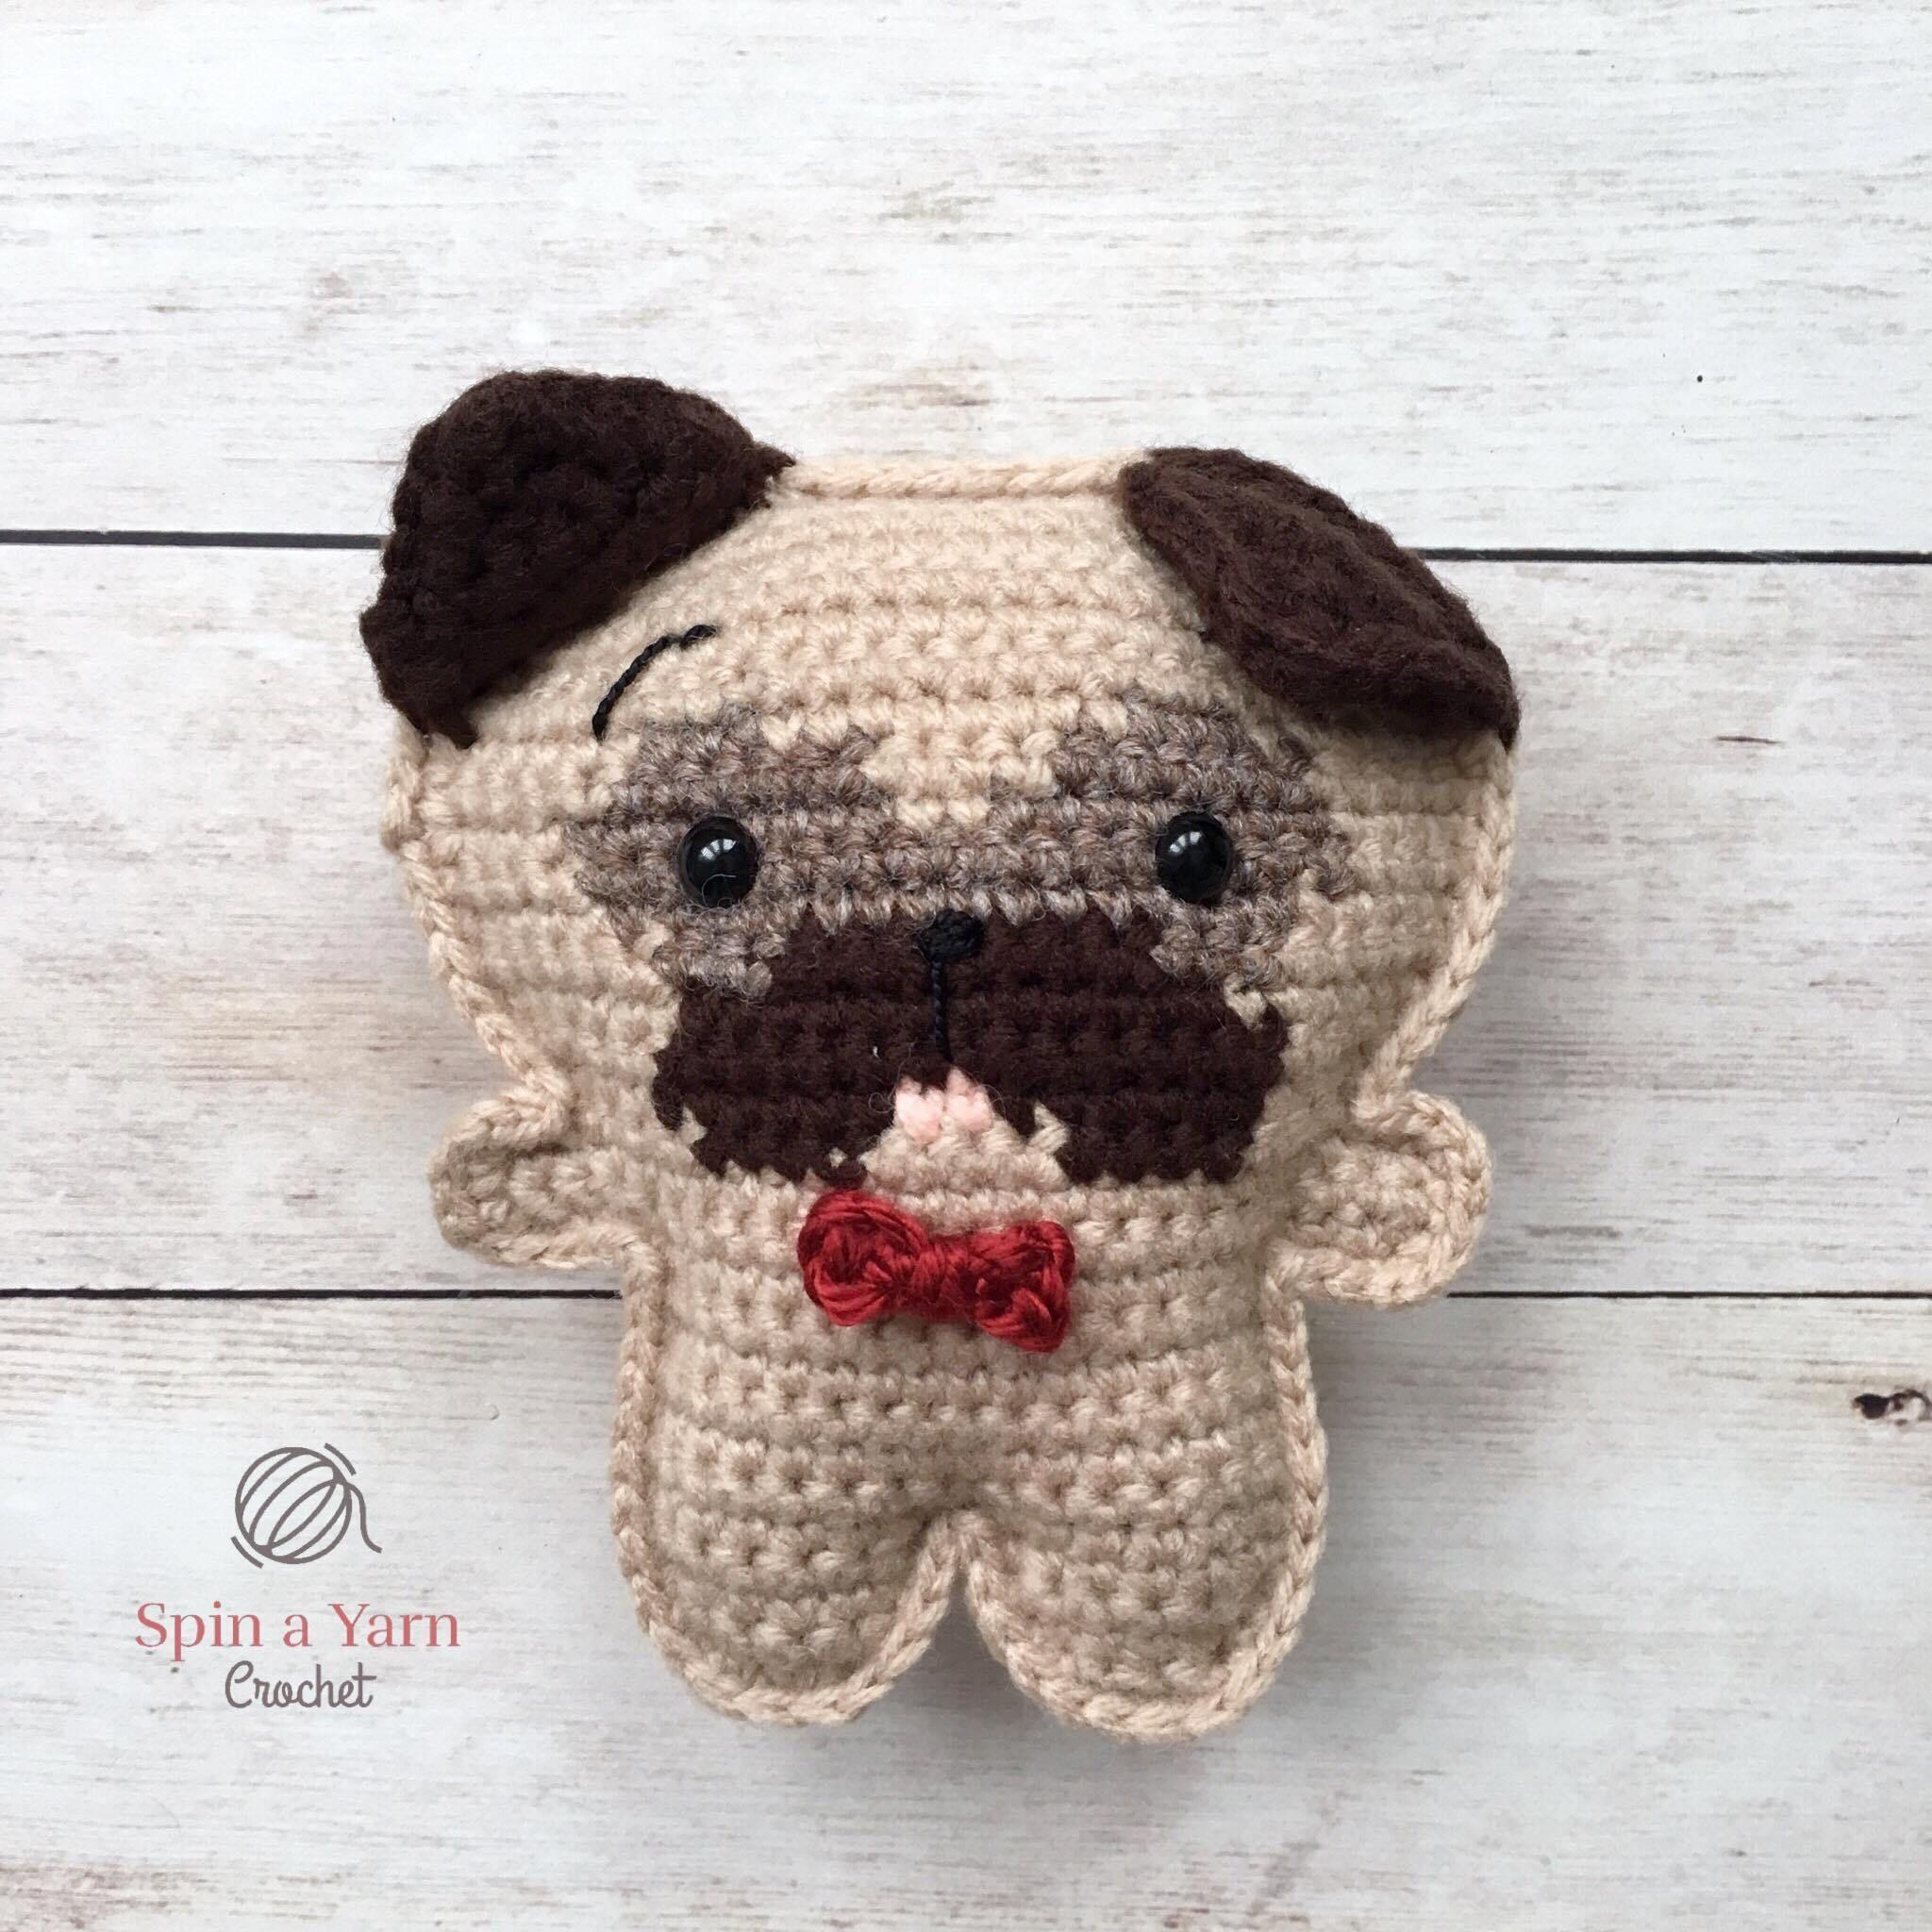 Pocket Pug Free Crochet Pattern | Crochet patterns ...